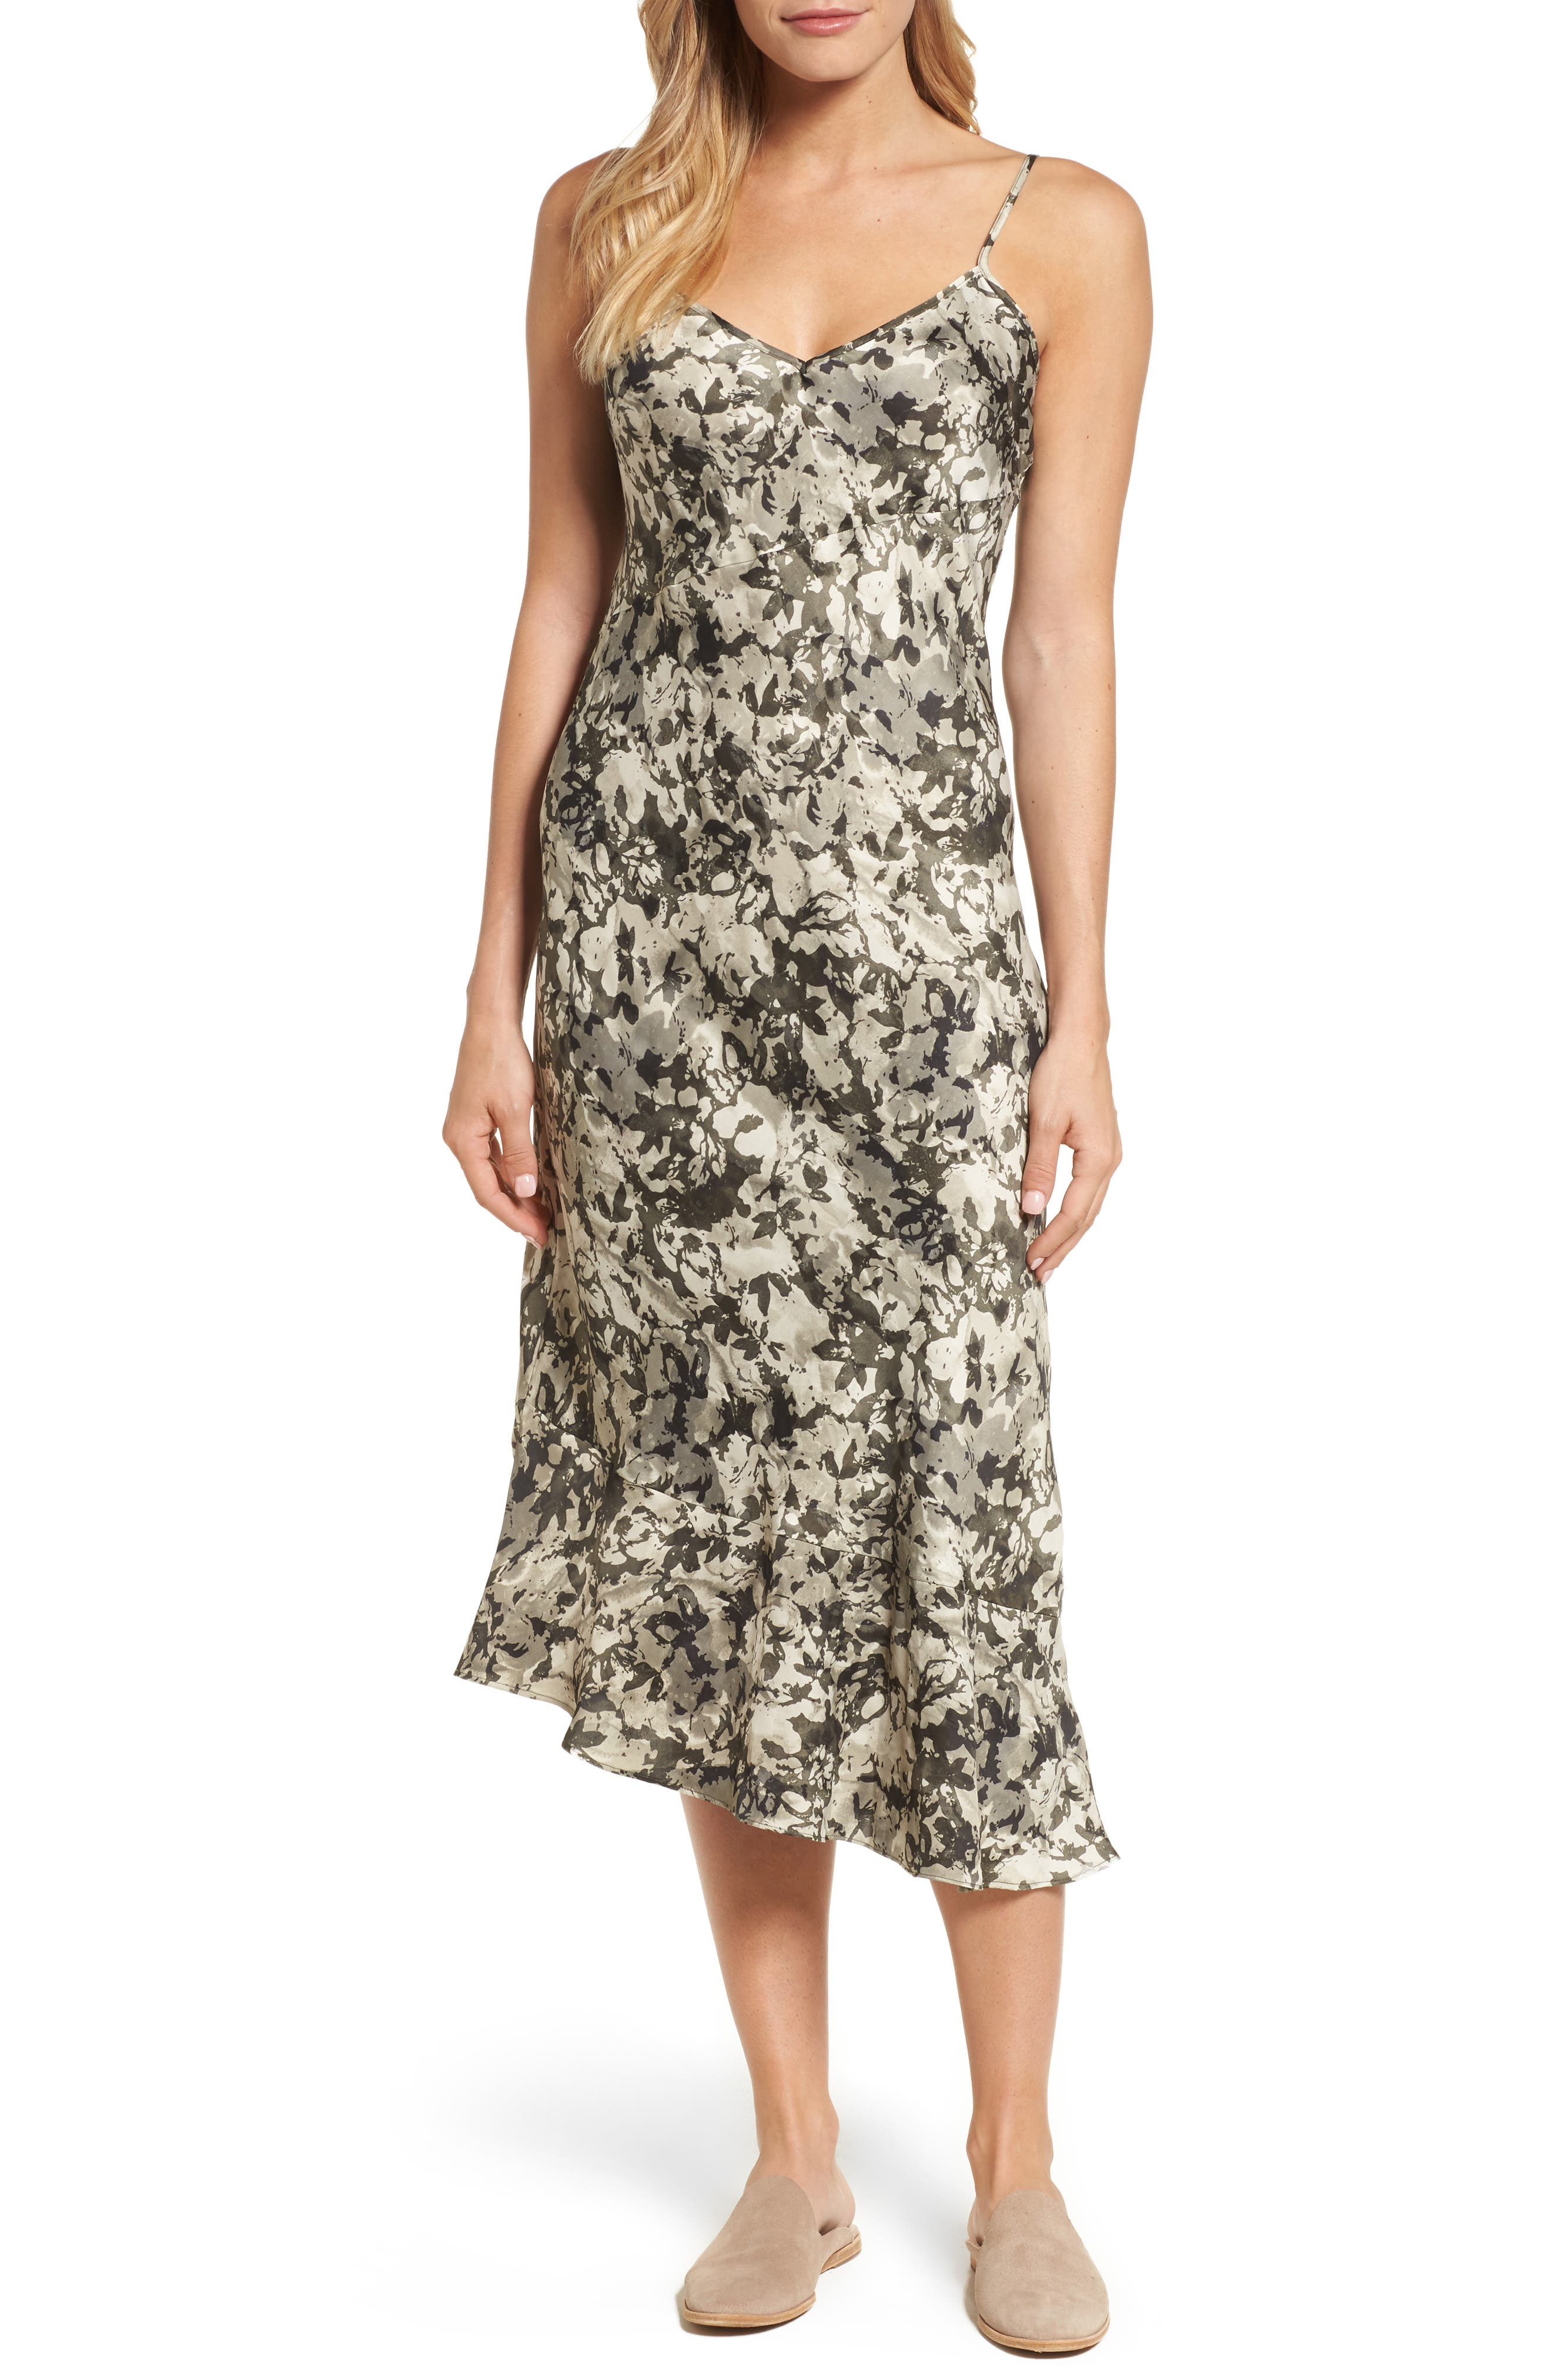 Camisole Midi Dress,                         Main,                         color, Camofoliage-Muslin